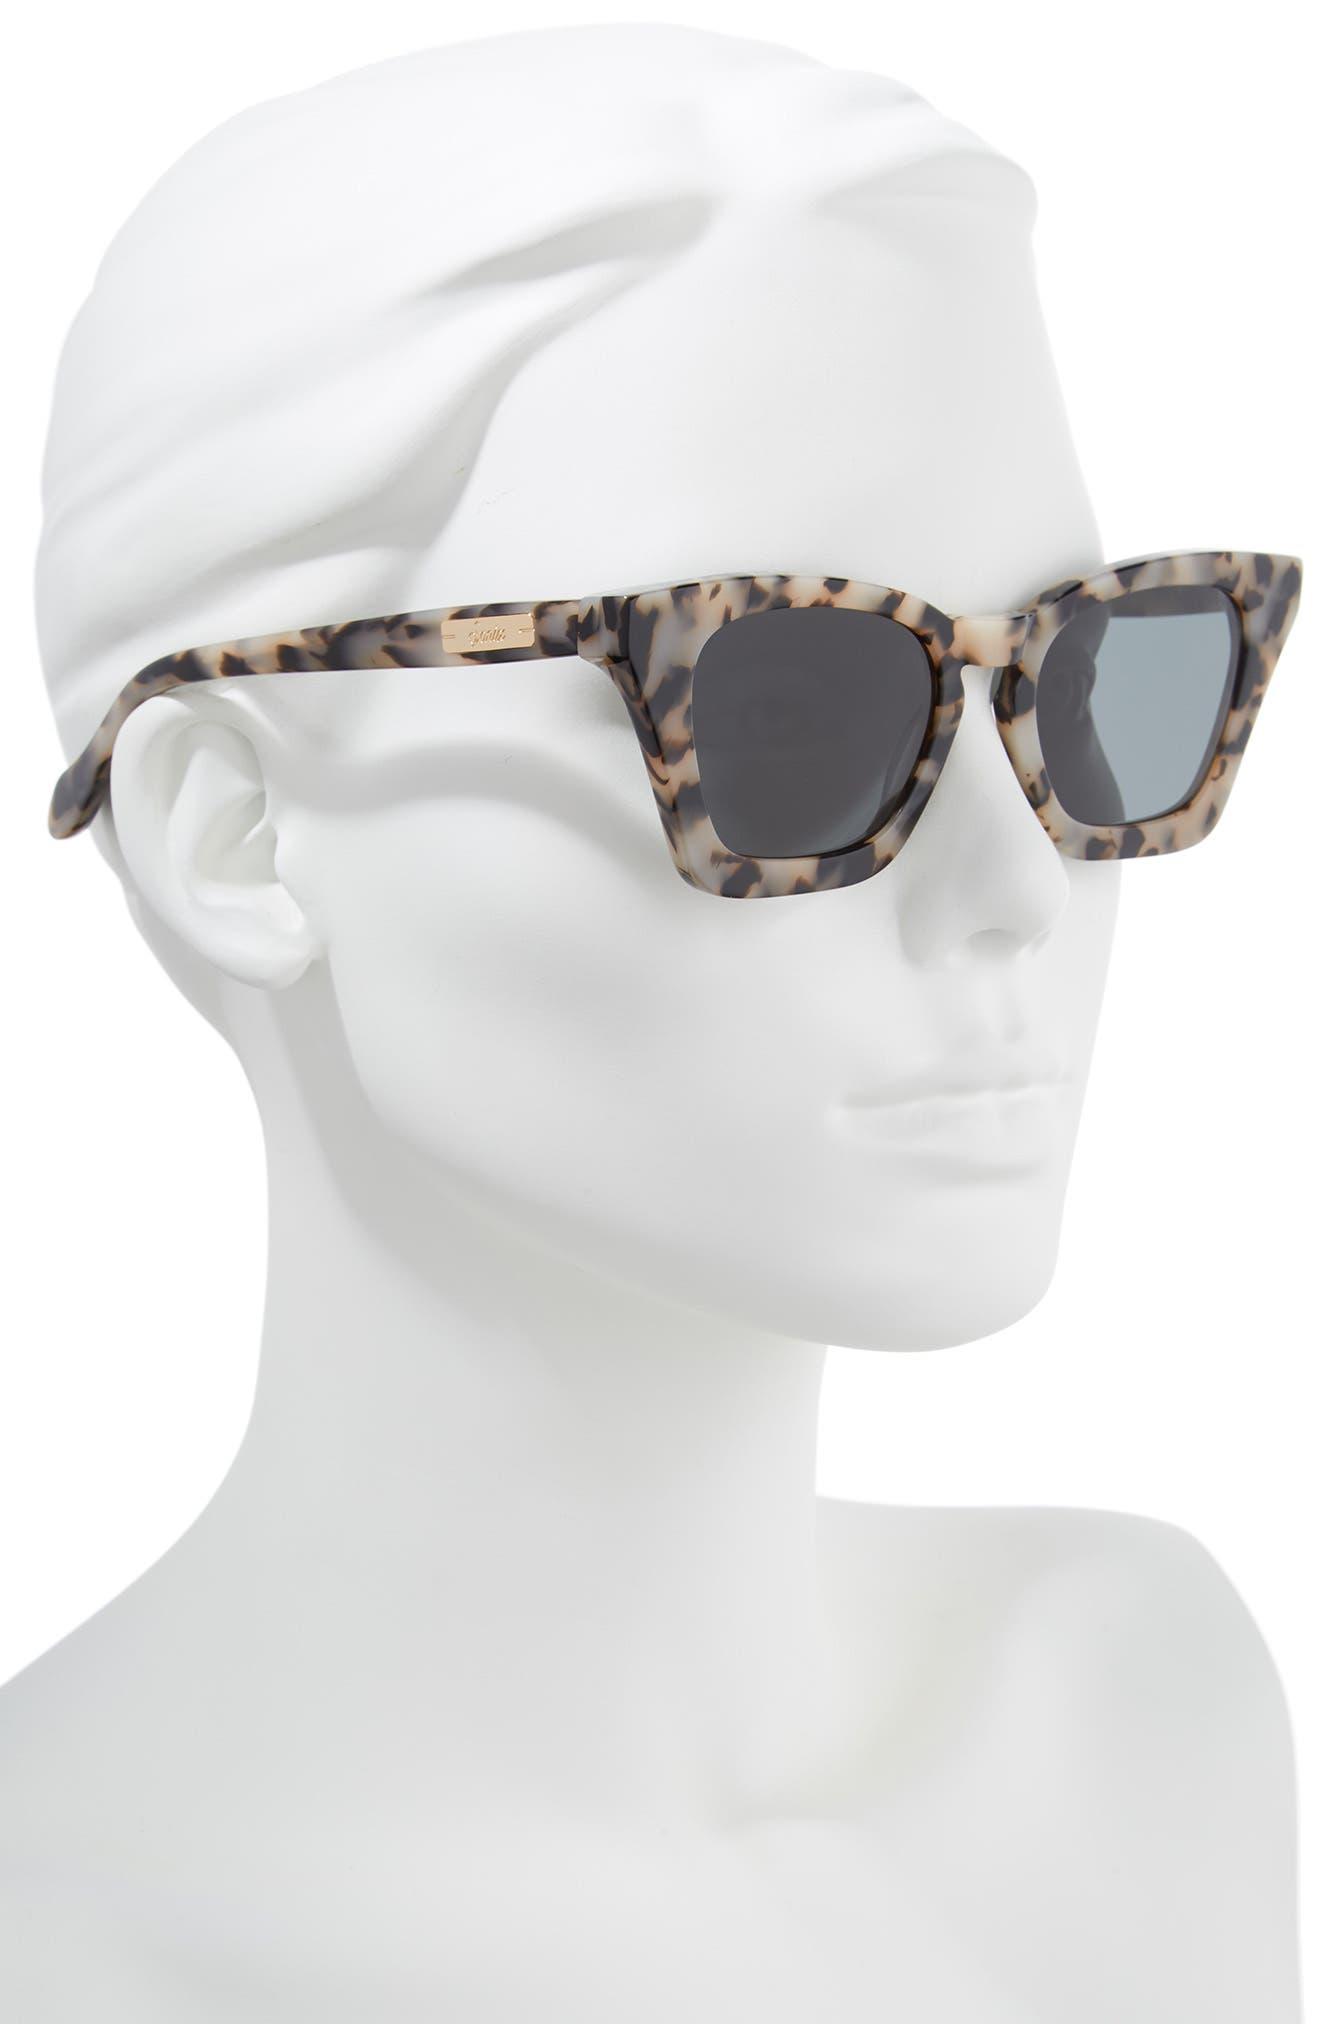 Ginza 50mm Cat Eye Sunglasses,                             Alternate thumbnail 2, color,                             Milk Tortoise/ Black Solid